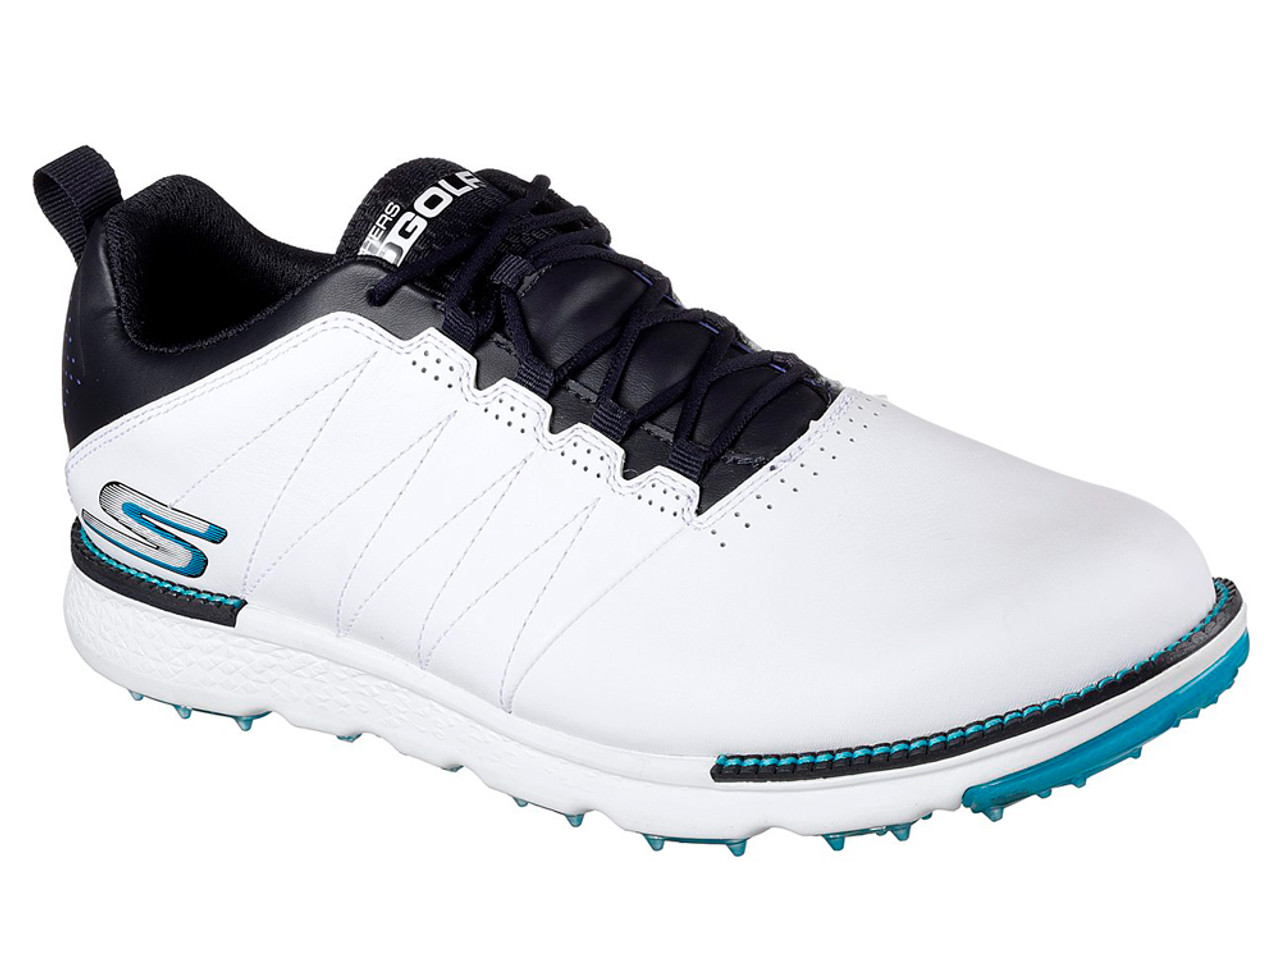 arrives utterly stylish most popular Skechers Go Golf Elite 3 Golf Shoes - White/Navy